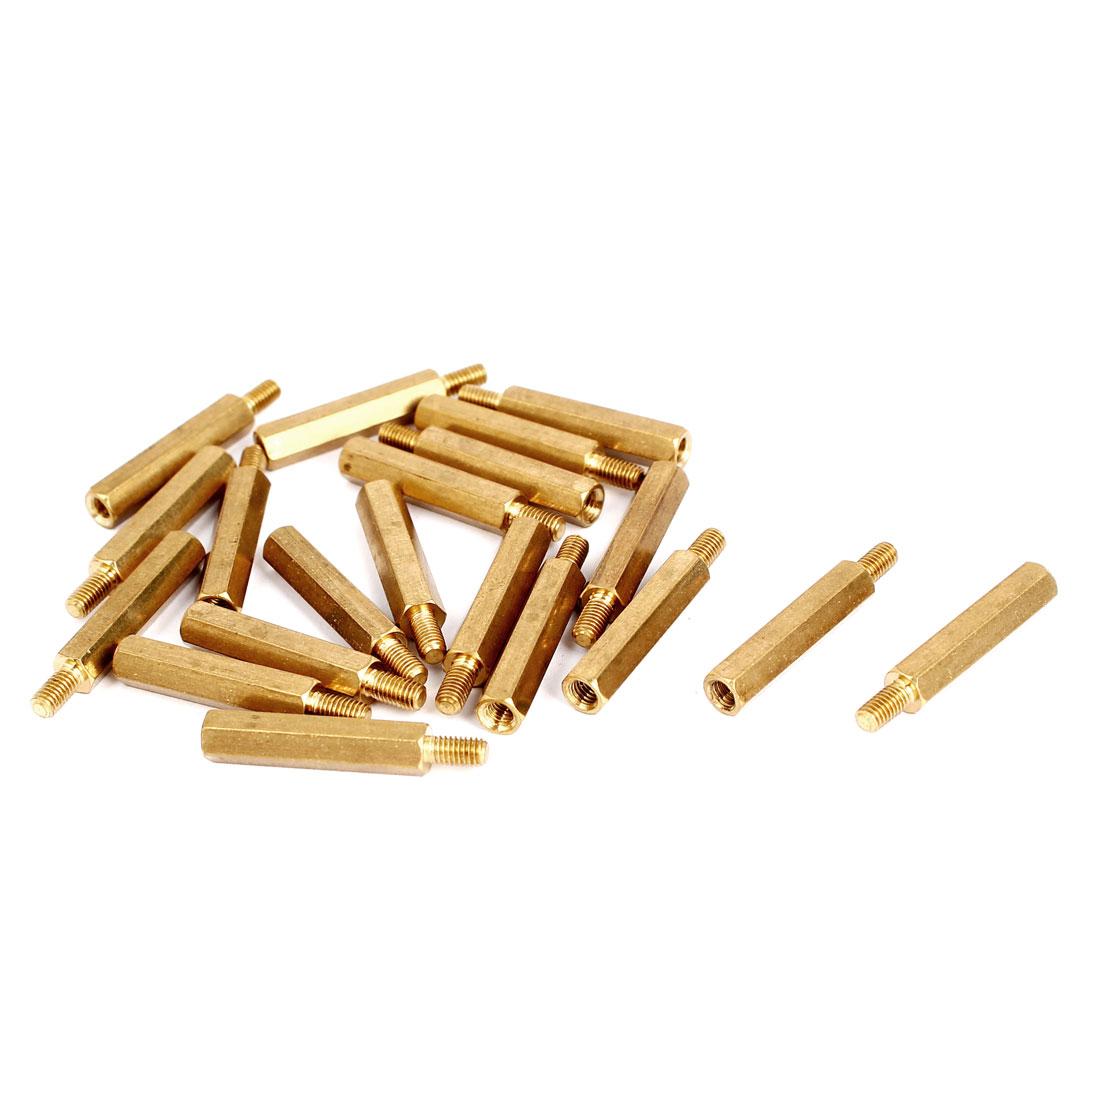 M3x22+6mm Male/Female Threaded Brass Hex Tapped Hexagonal Spacer Standoff Pillar 20pcs